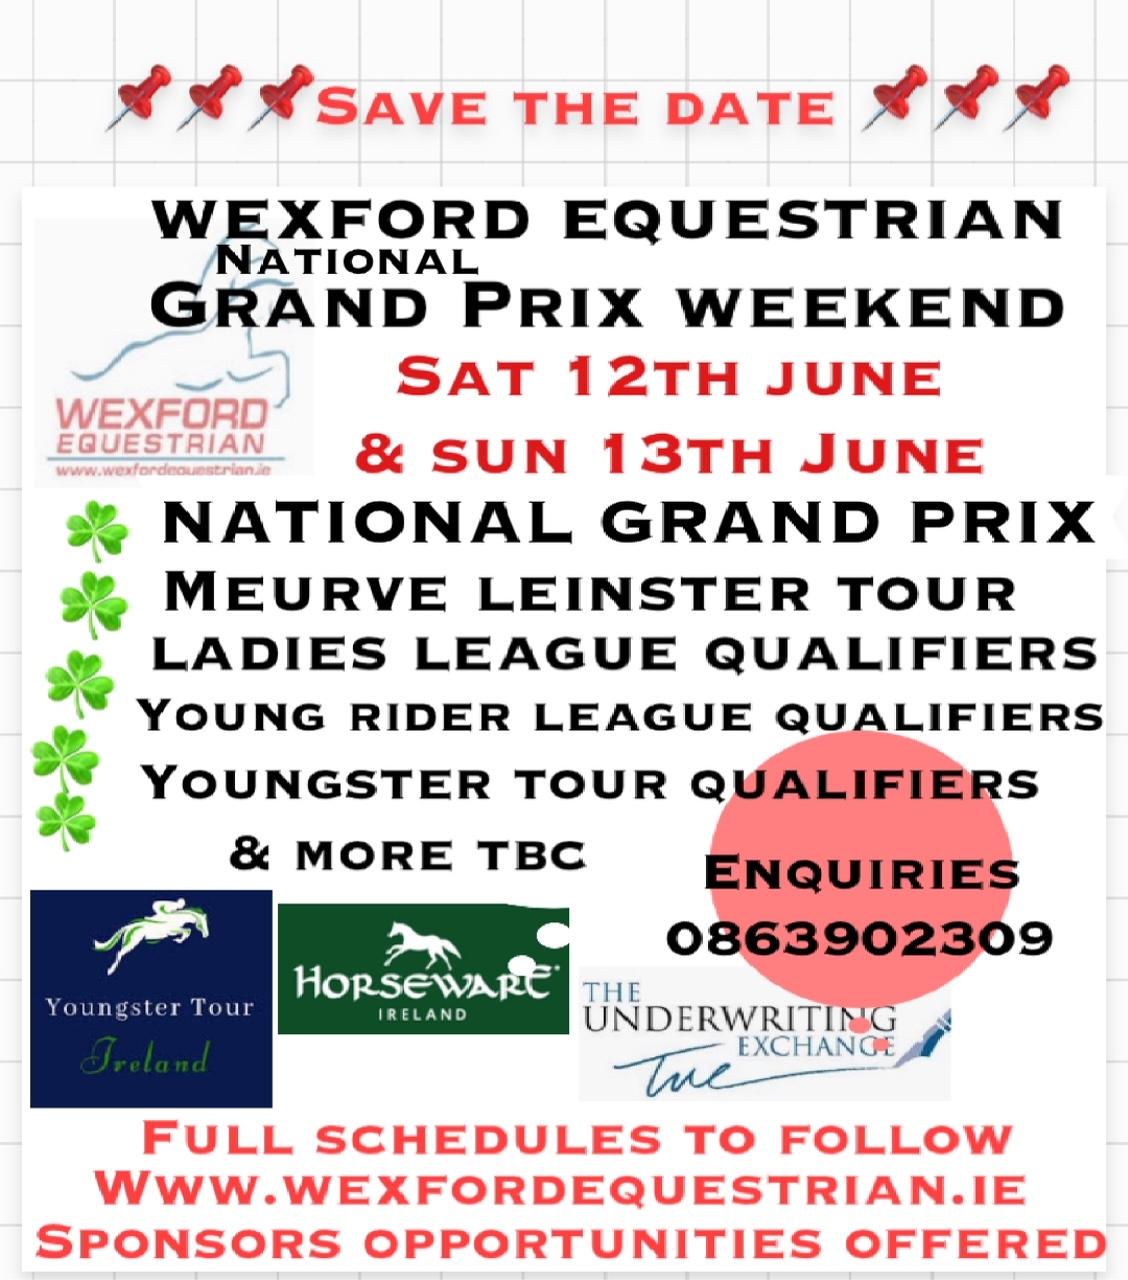 National Grand Prix Weekend